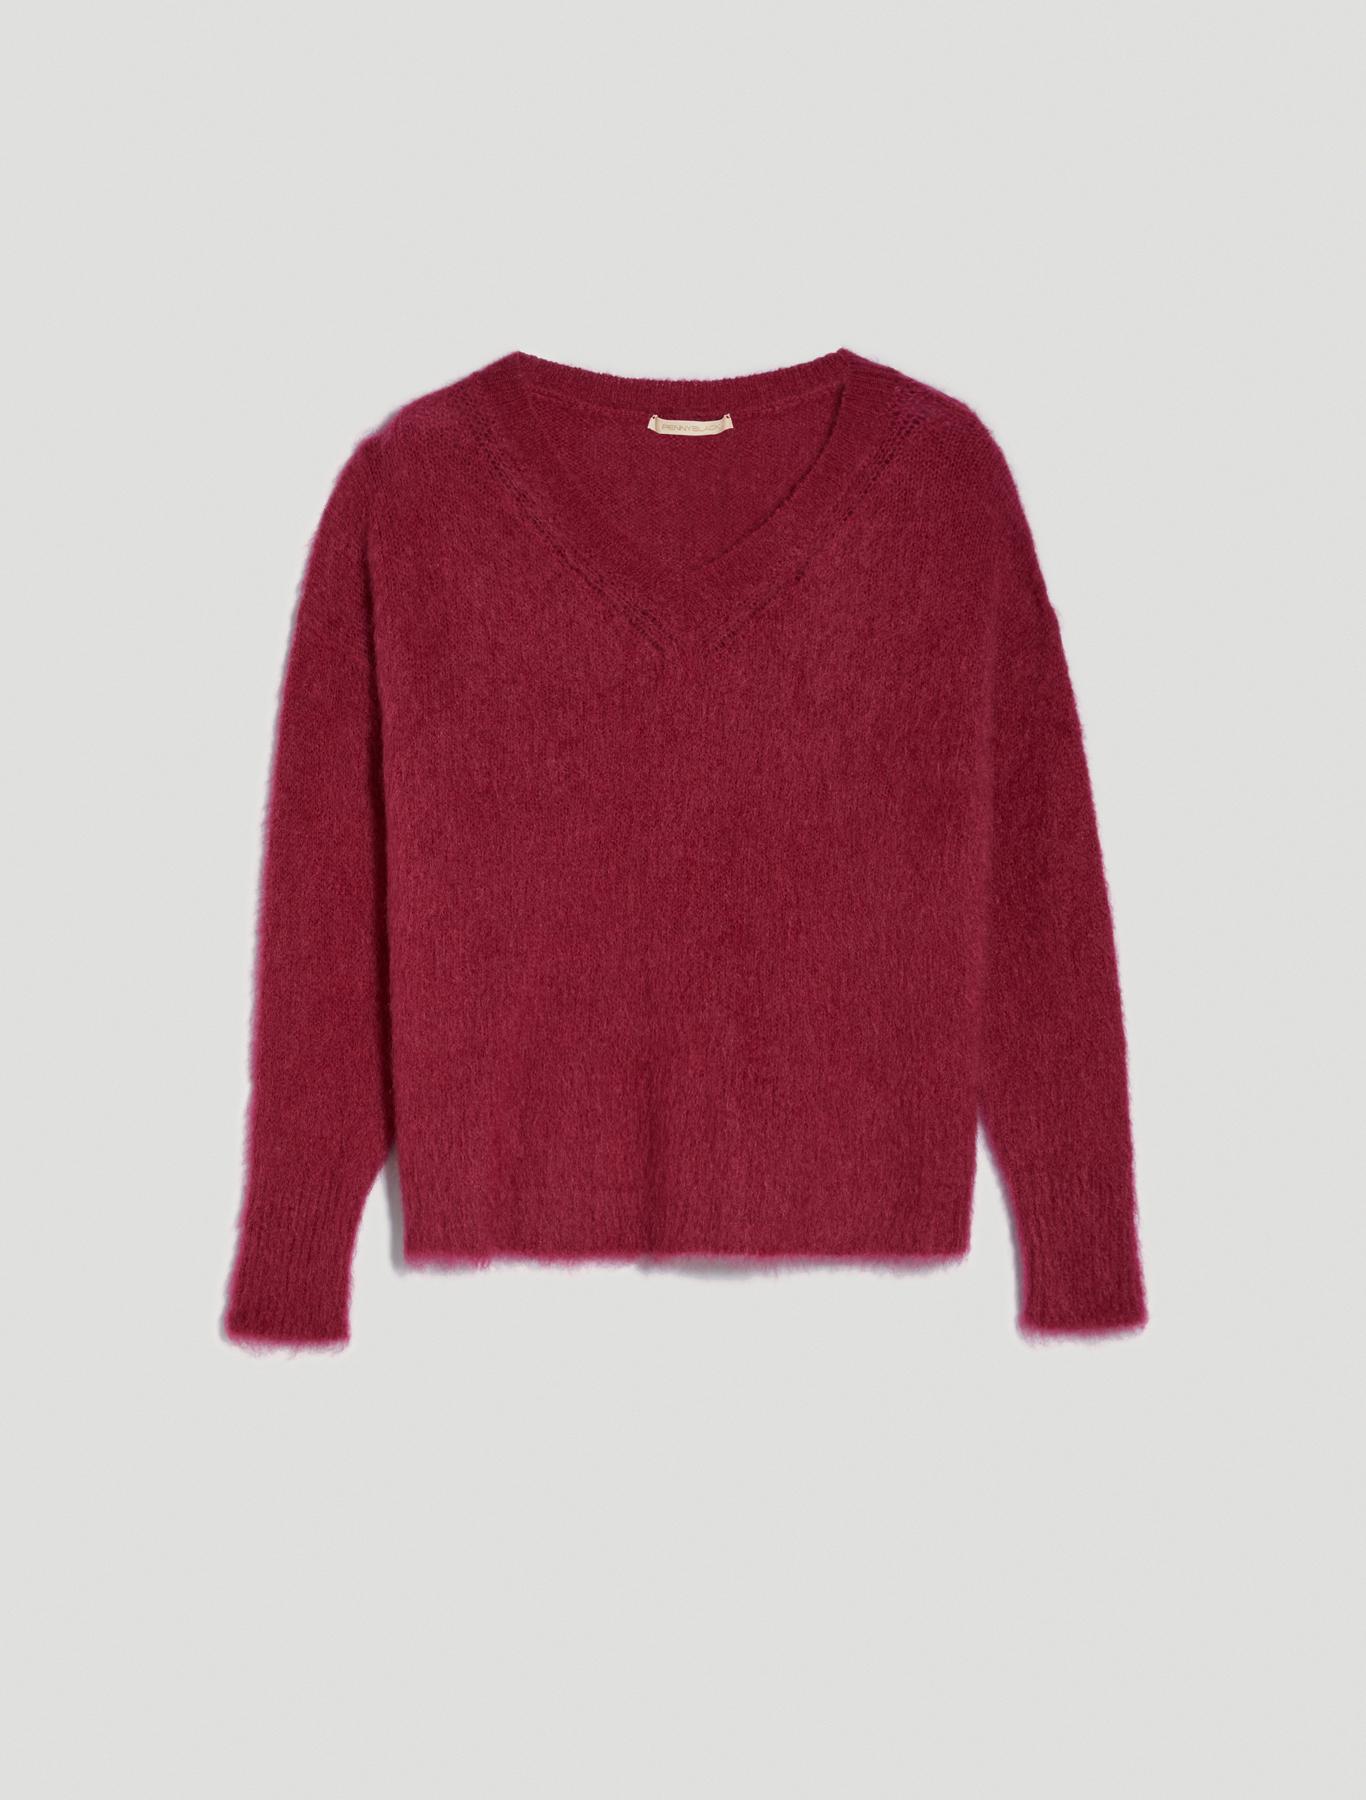 Mohair blend pullover - burgundy - pennyblack